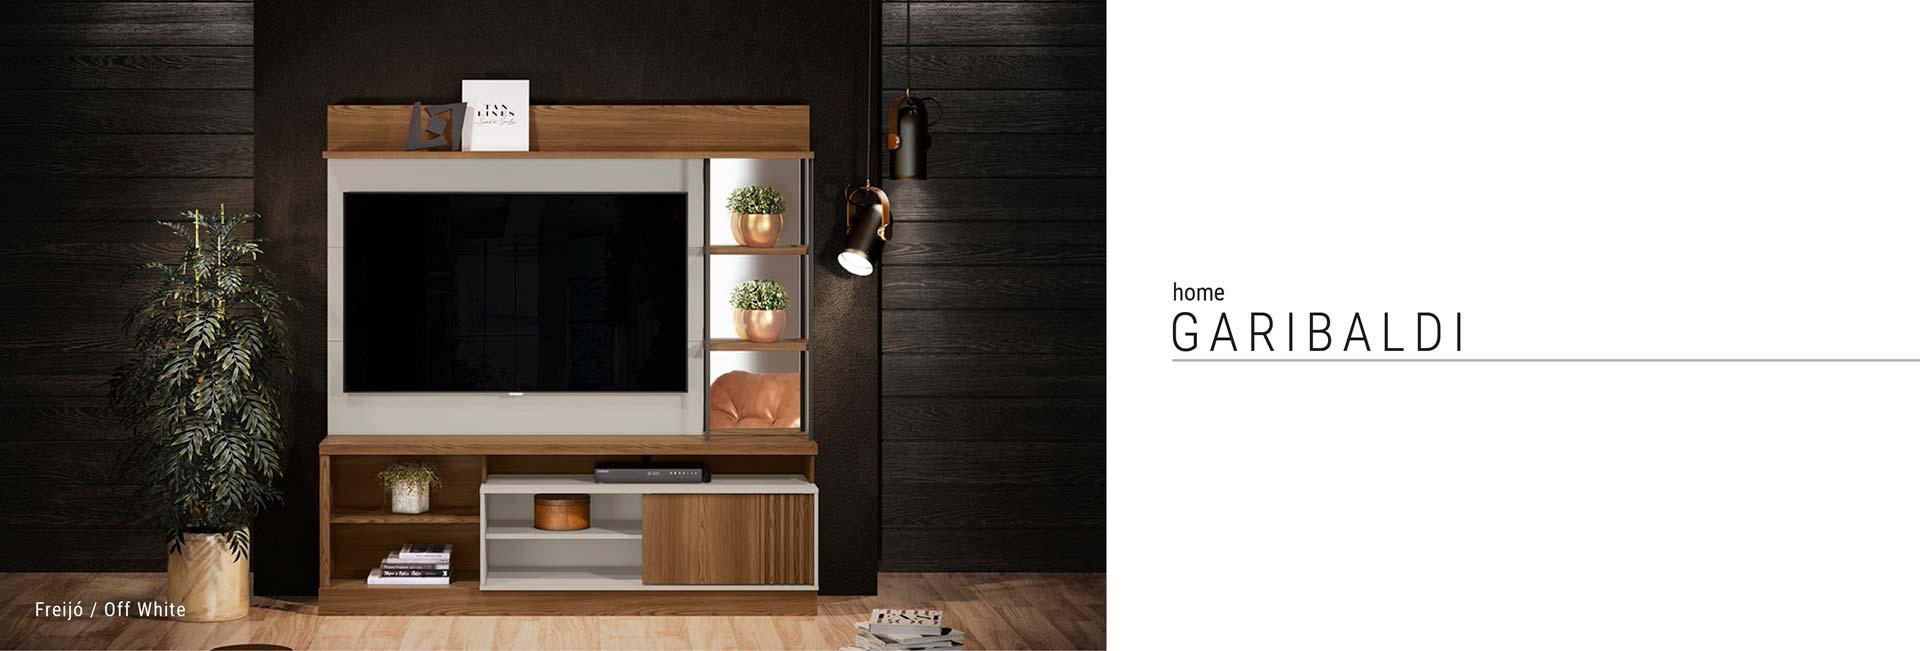 Home Garibaldi